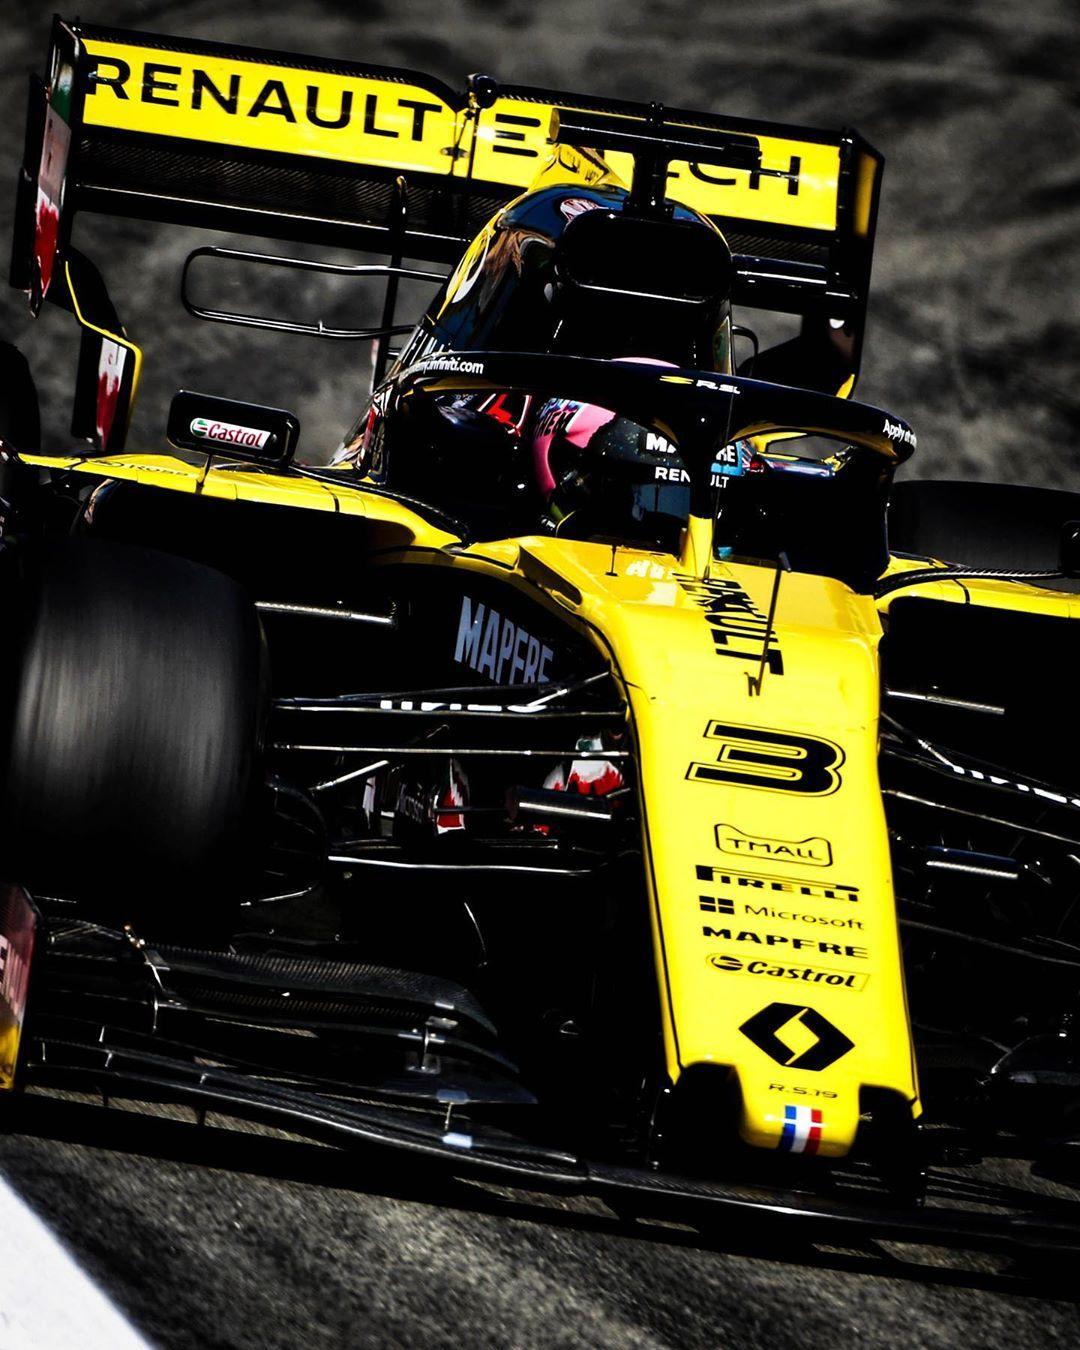 "Renault F1 Team On Instagram: ""Daniel Ricciardo"